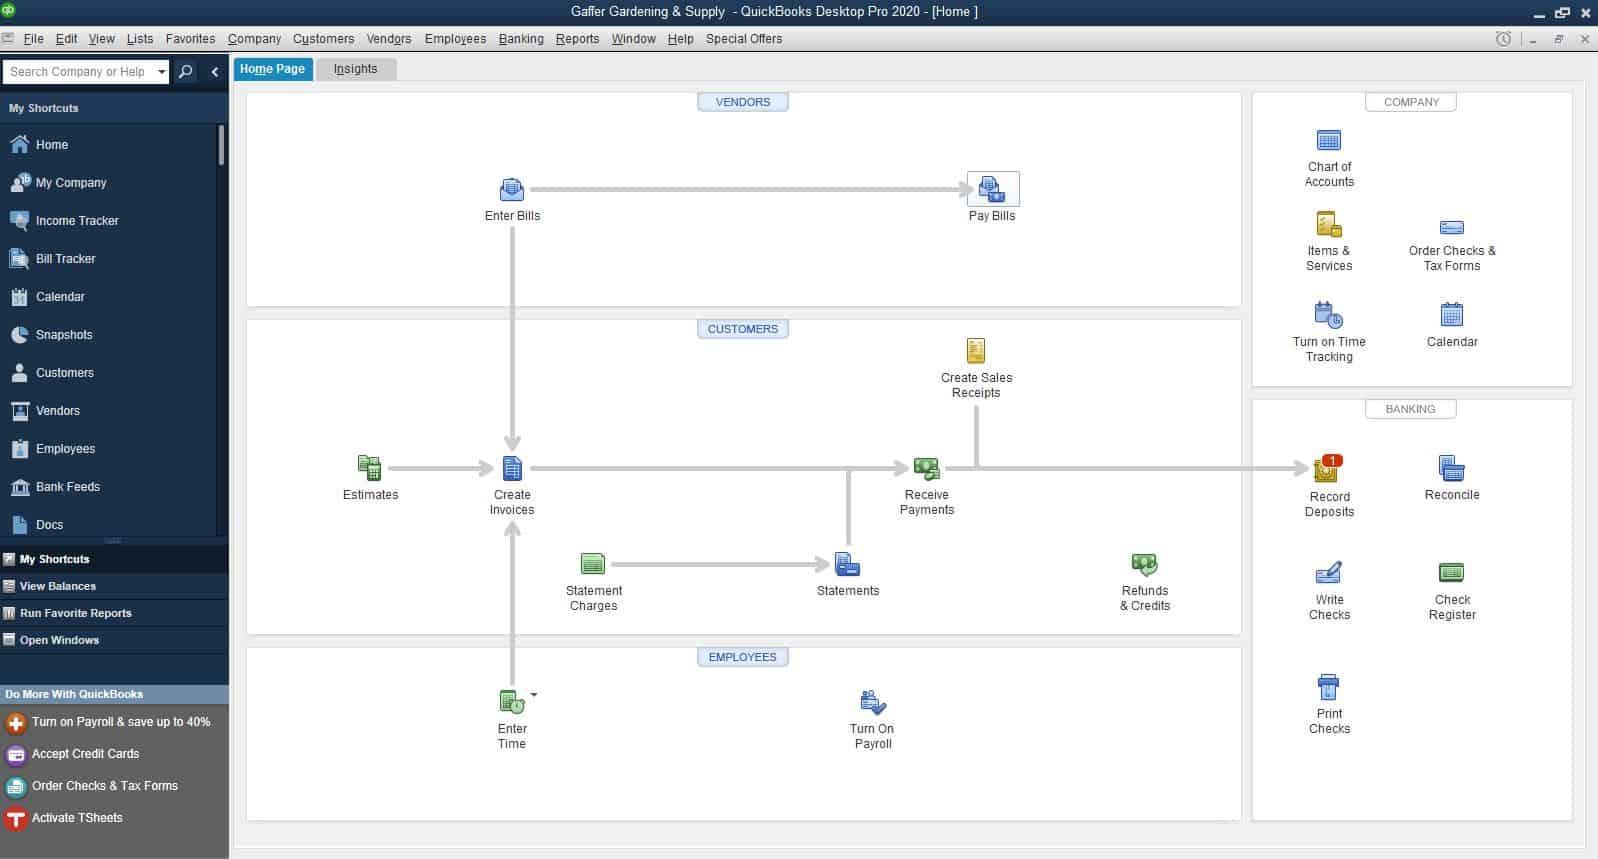 quickbooks desktop pro homepage navigation